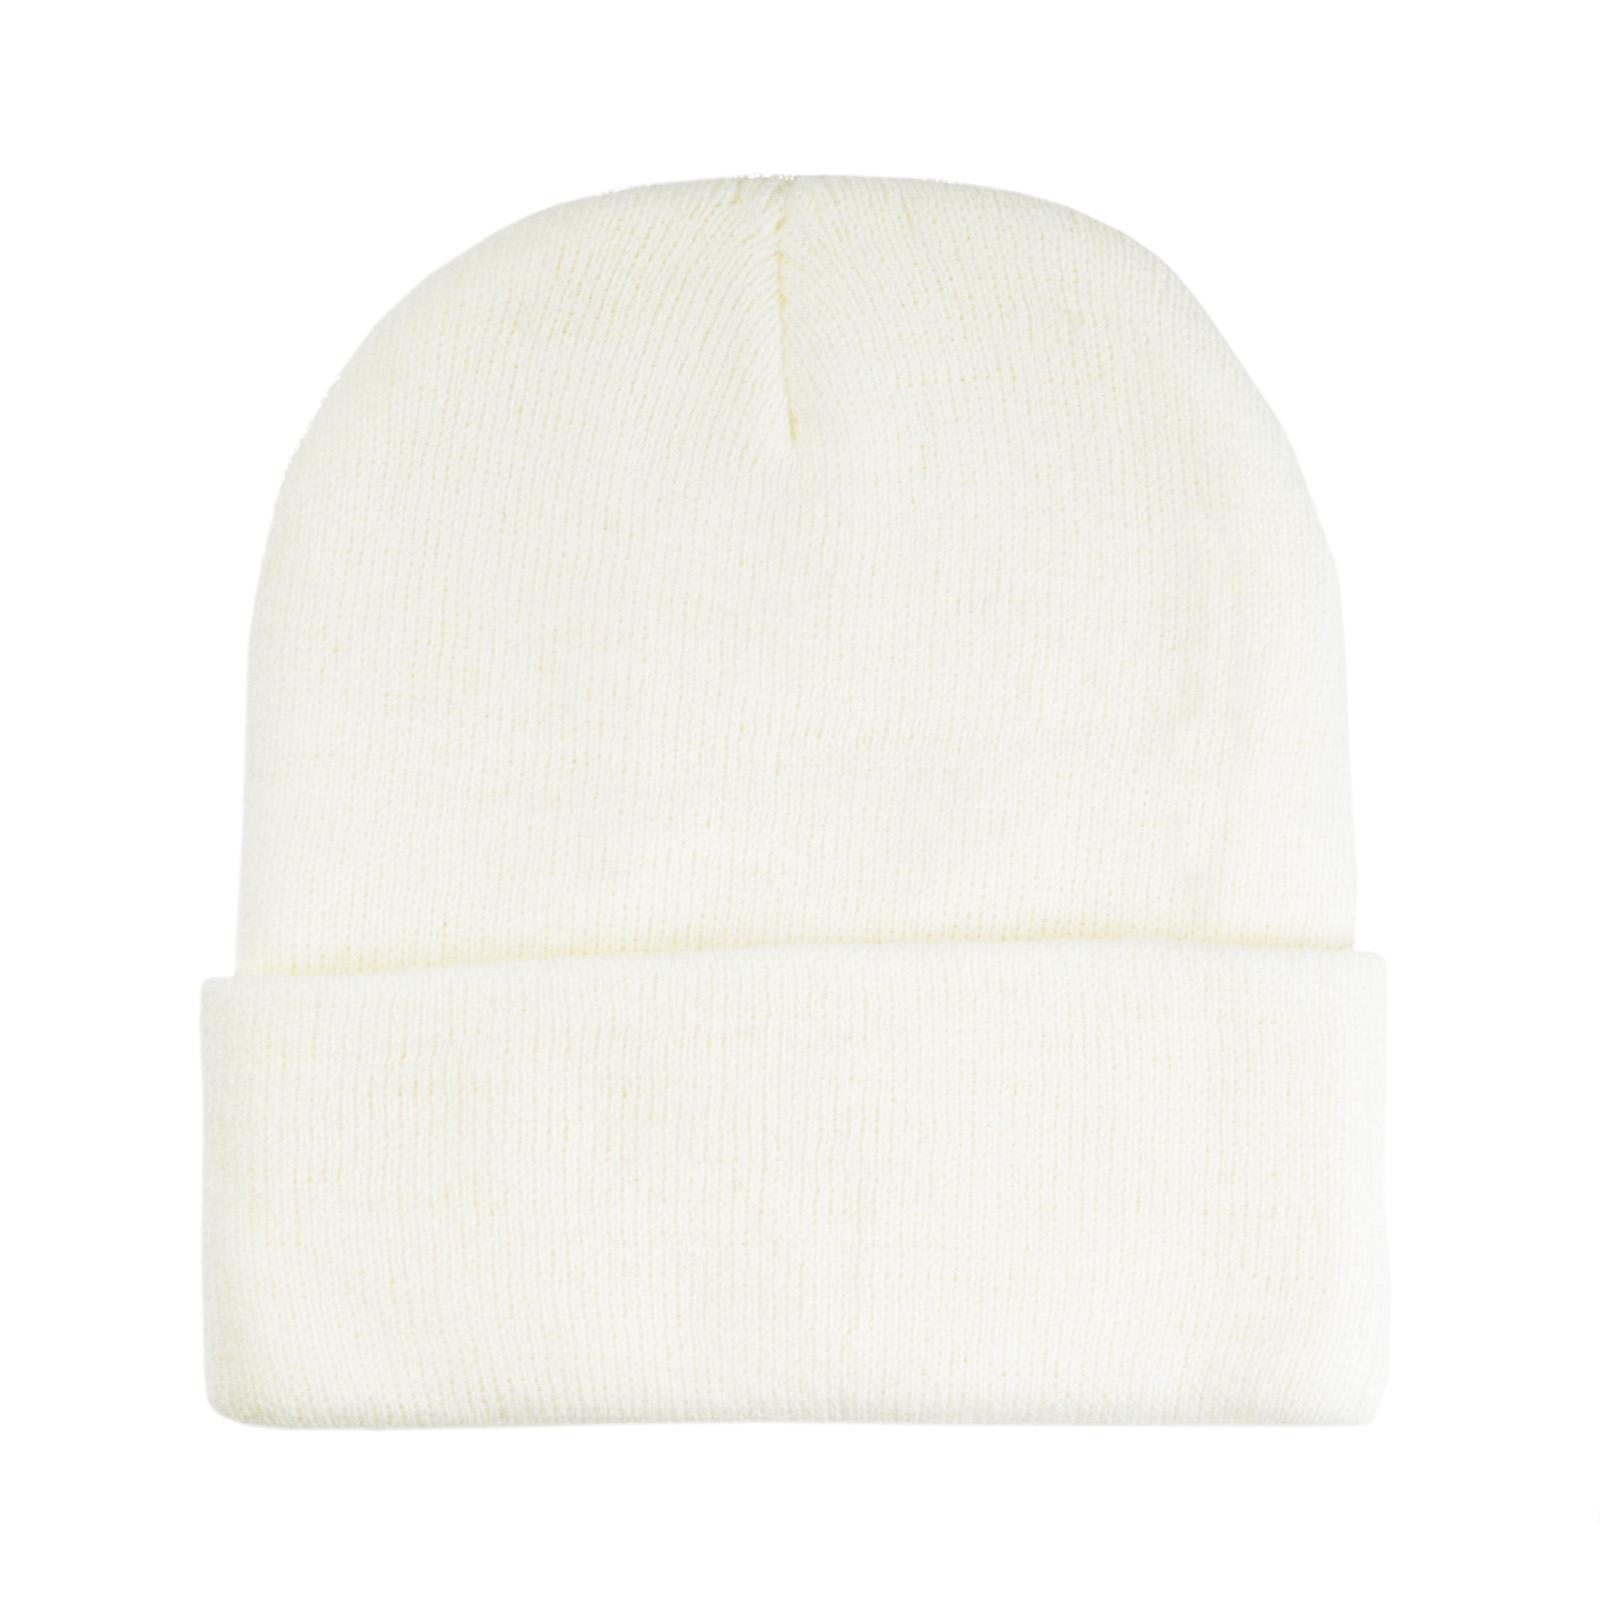 bonnet-court-blanc-CP-00061-A16